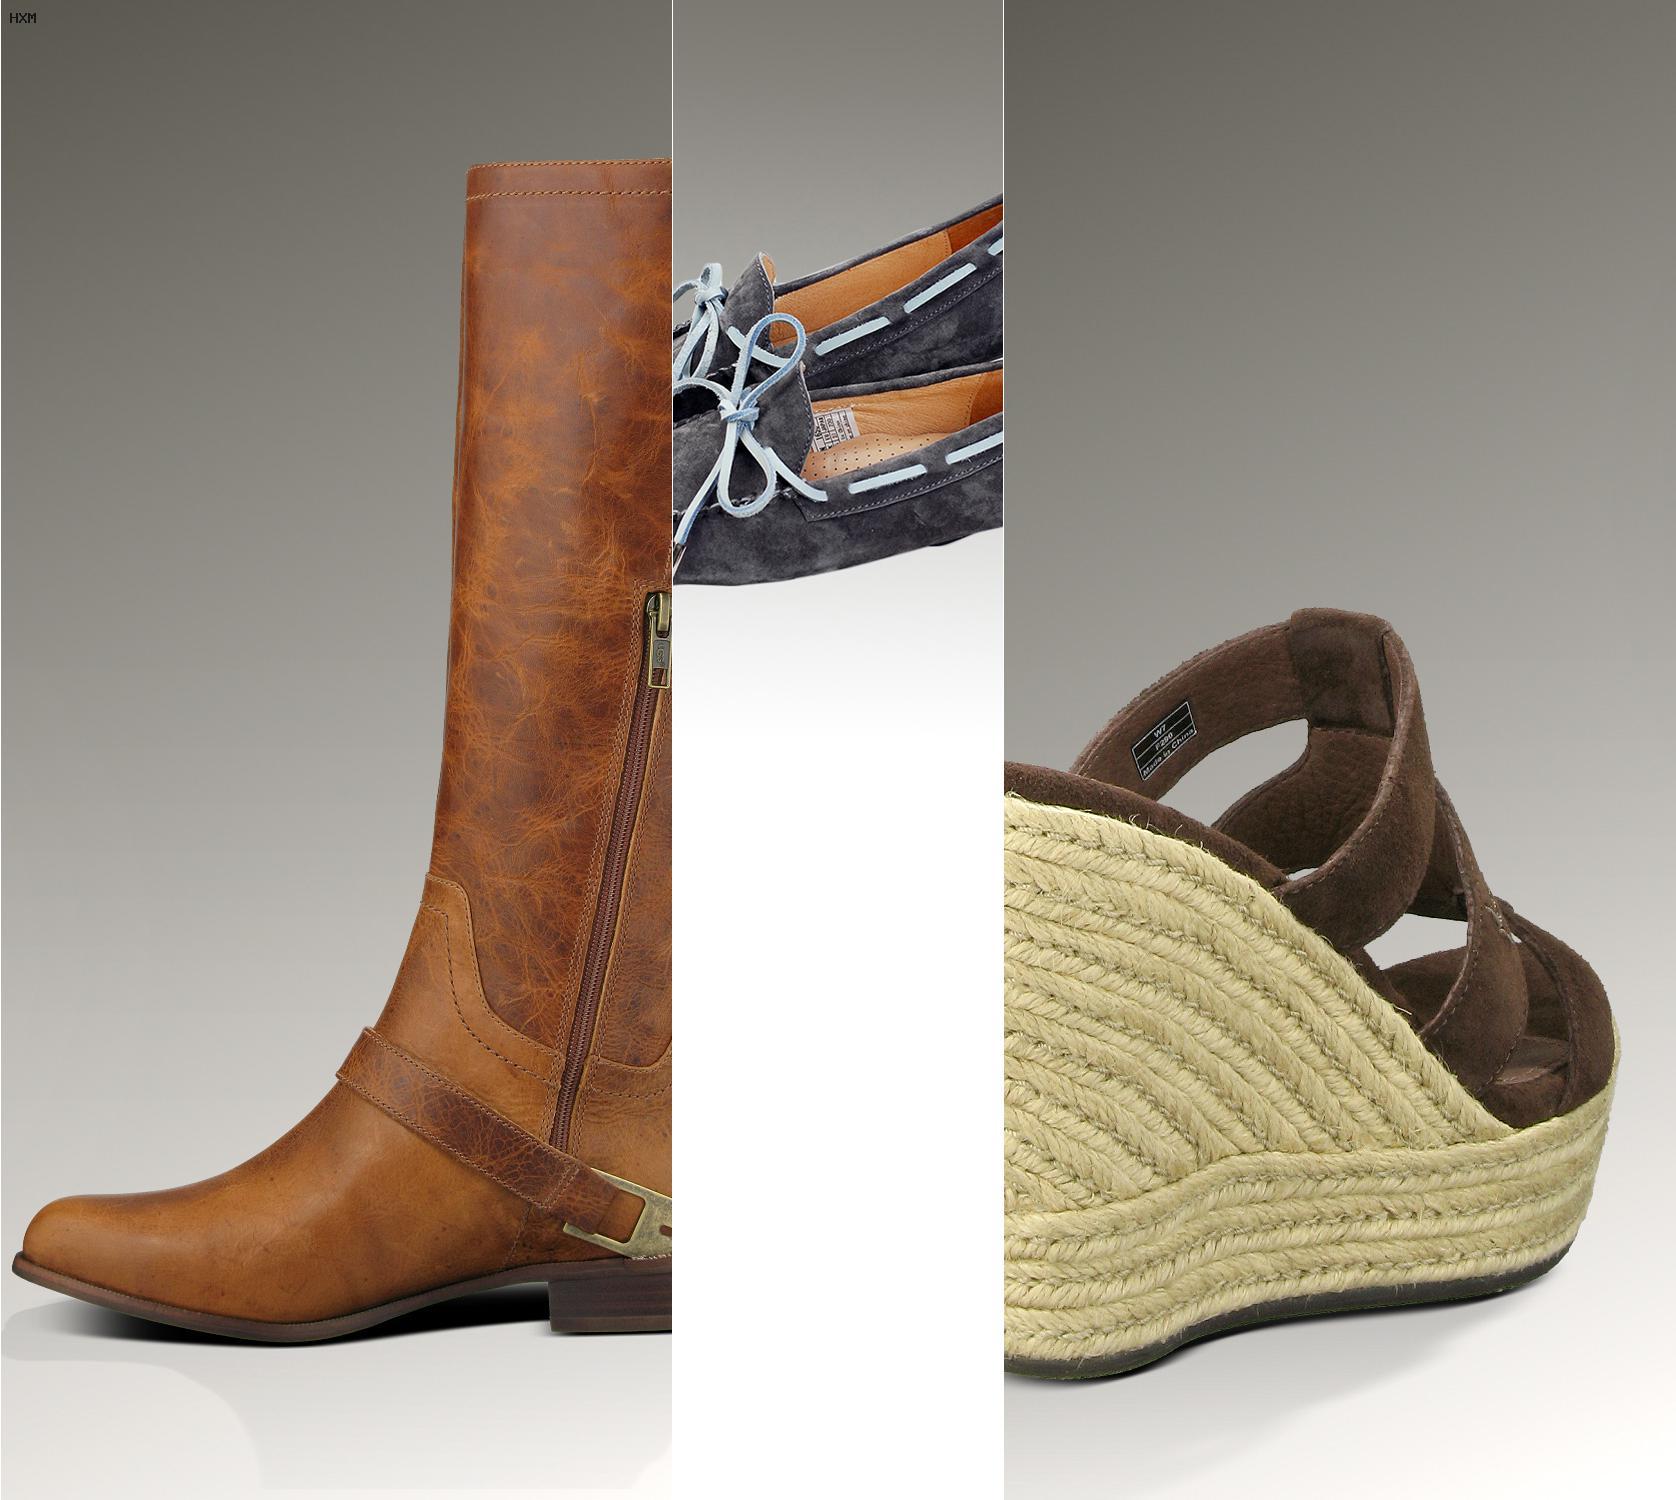 ugg boots moonee ponds